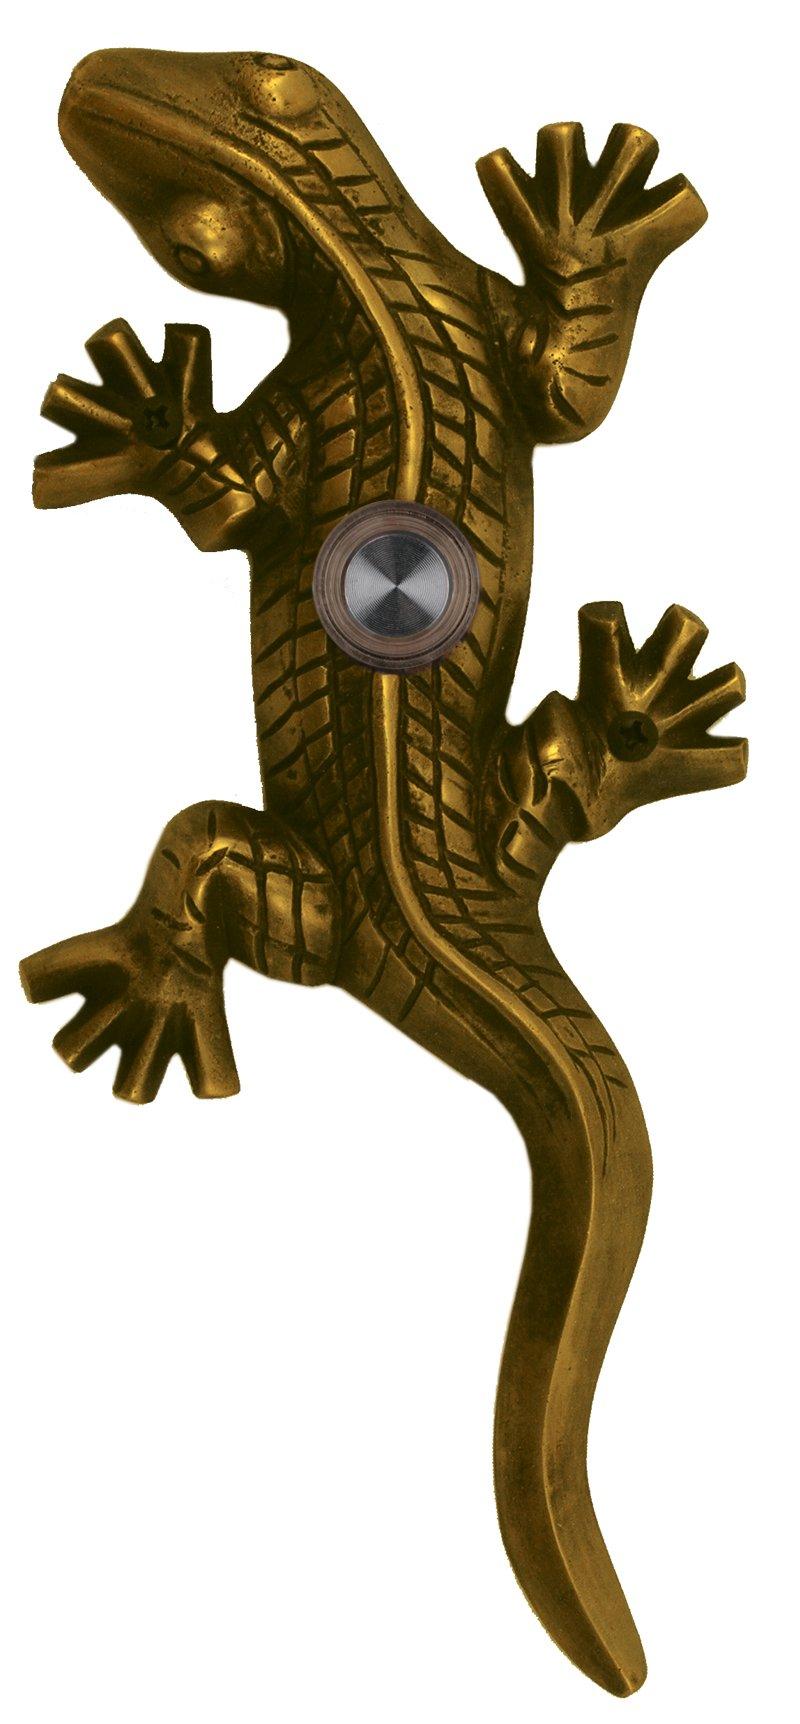 Waterwood Brass Large Lizard / Gecko Doorbell in Antique Brass